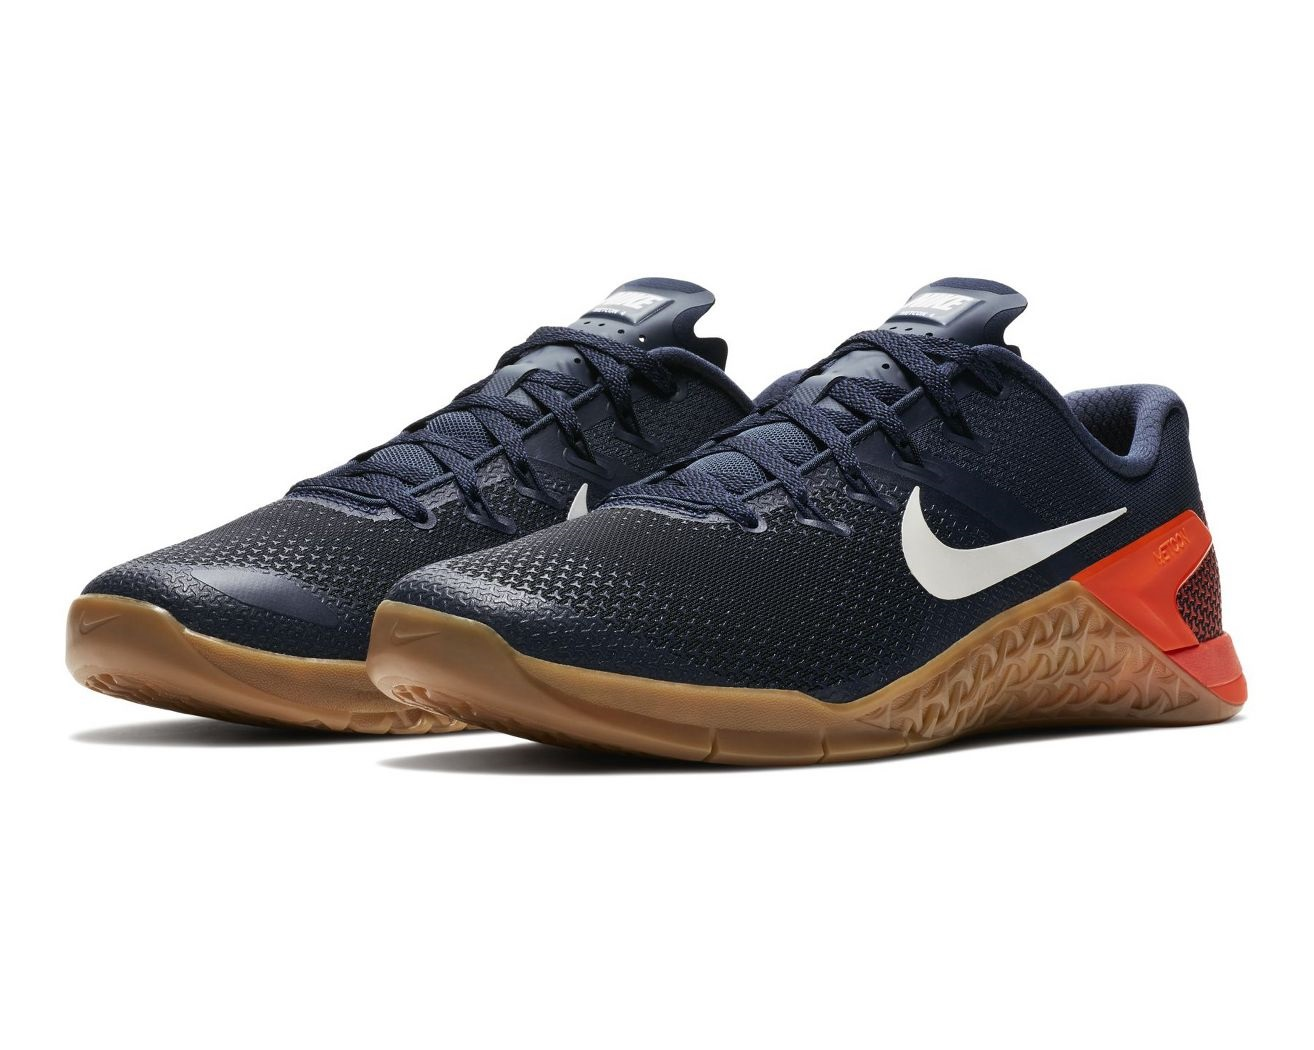 Nike METCON 4 Launch Colorways \u0026 PRE